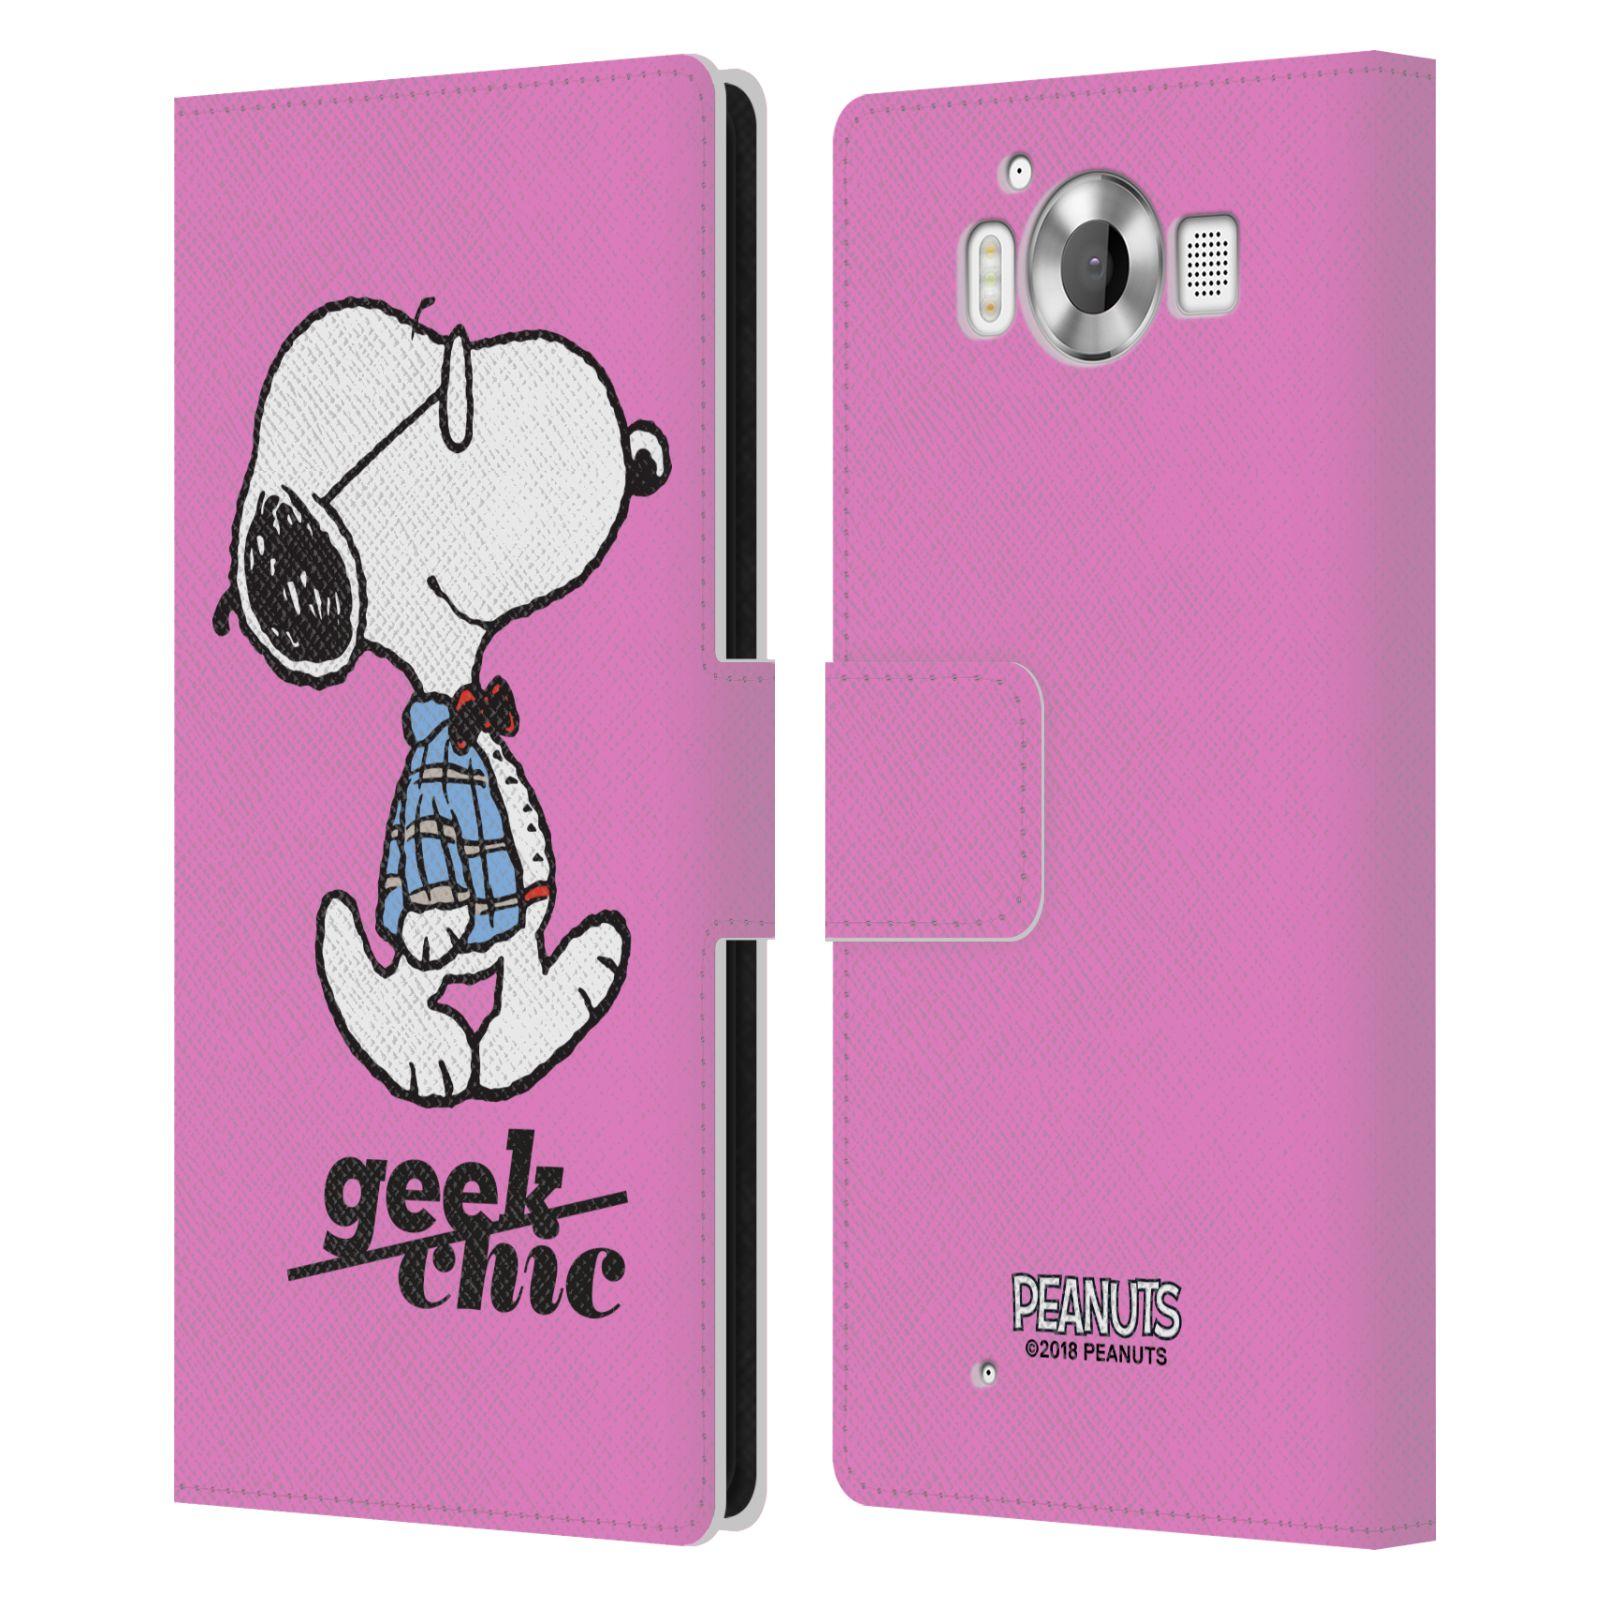 Pouzdro na mobil Nokia Lumia 950 - Head Case - Peanuts - růžový pejsek snoopy nerd